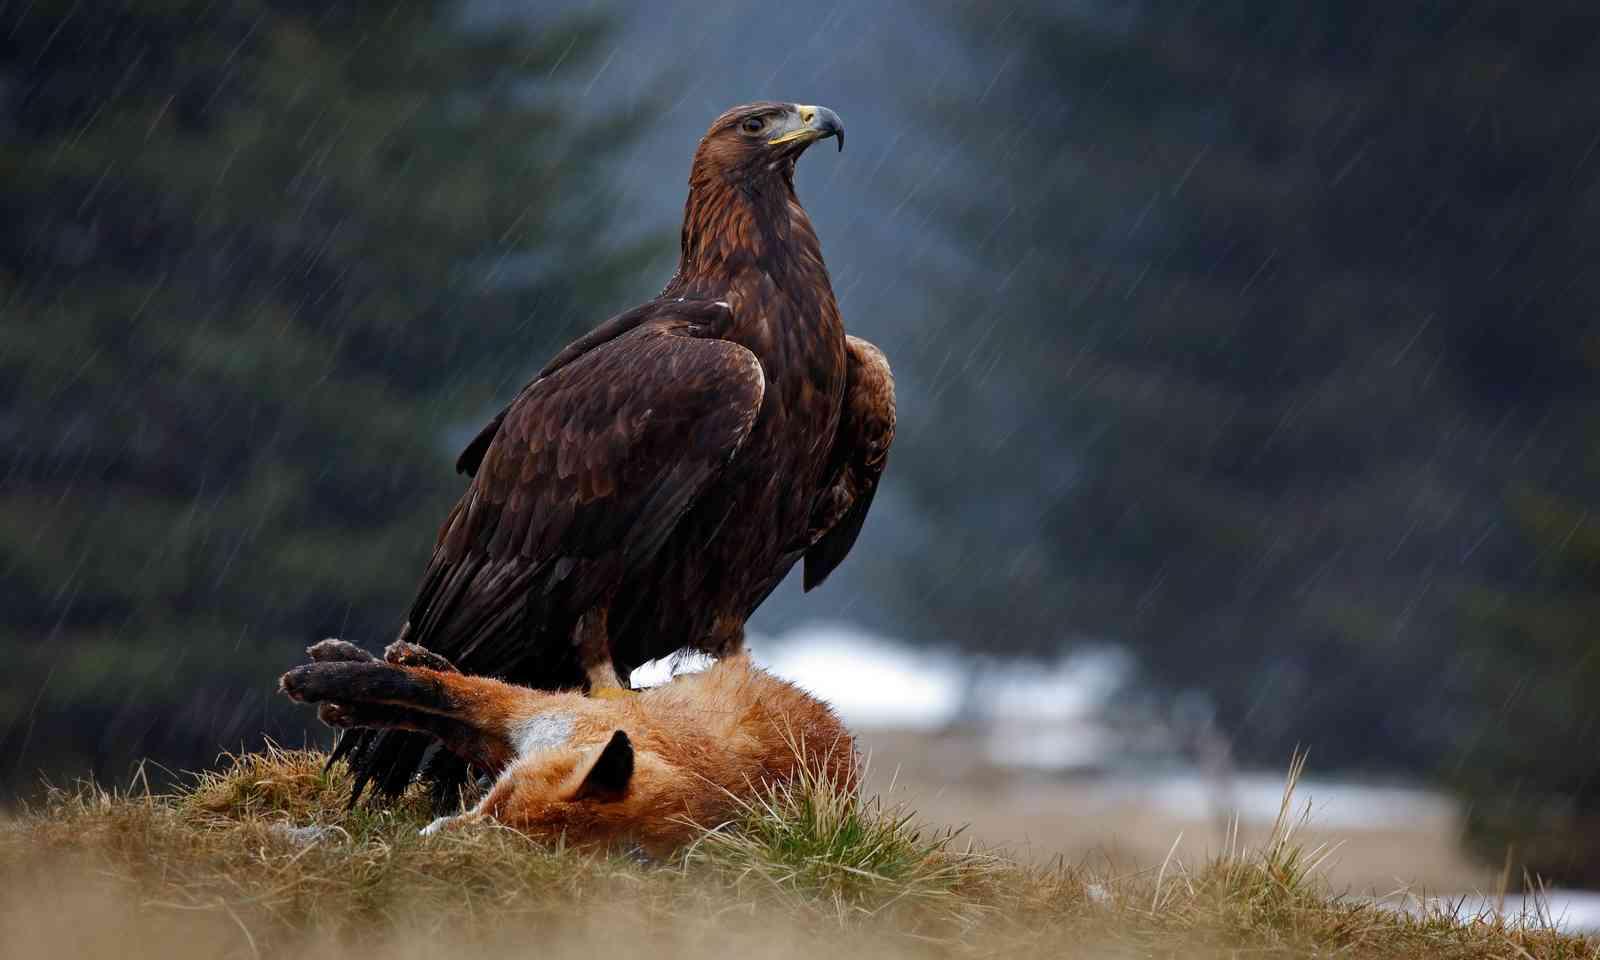 Golden Eagle feeding on a fox in Sweden (Dreamstime)